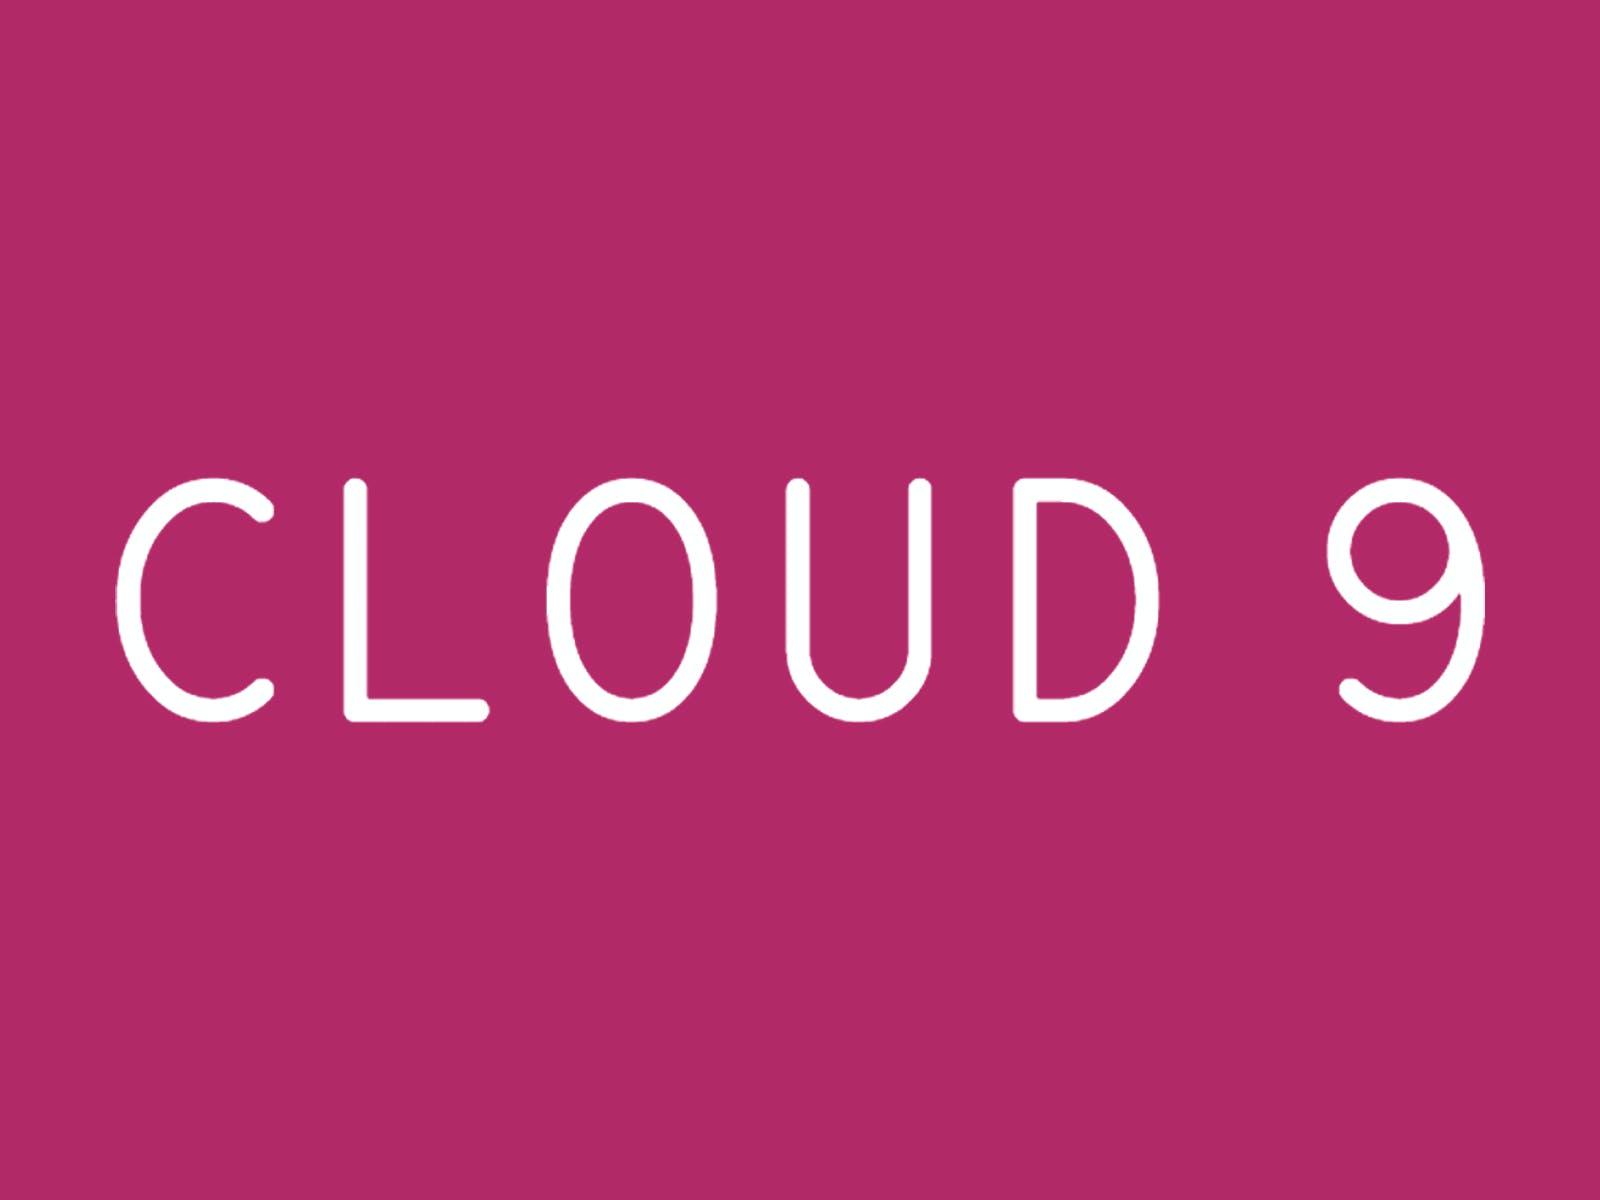 Cloud 9 Tickets Sf Bay Area Todaytix